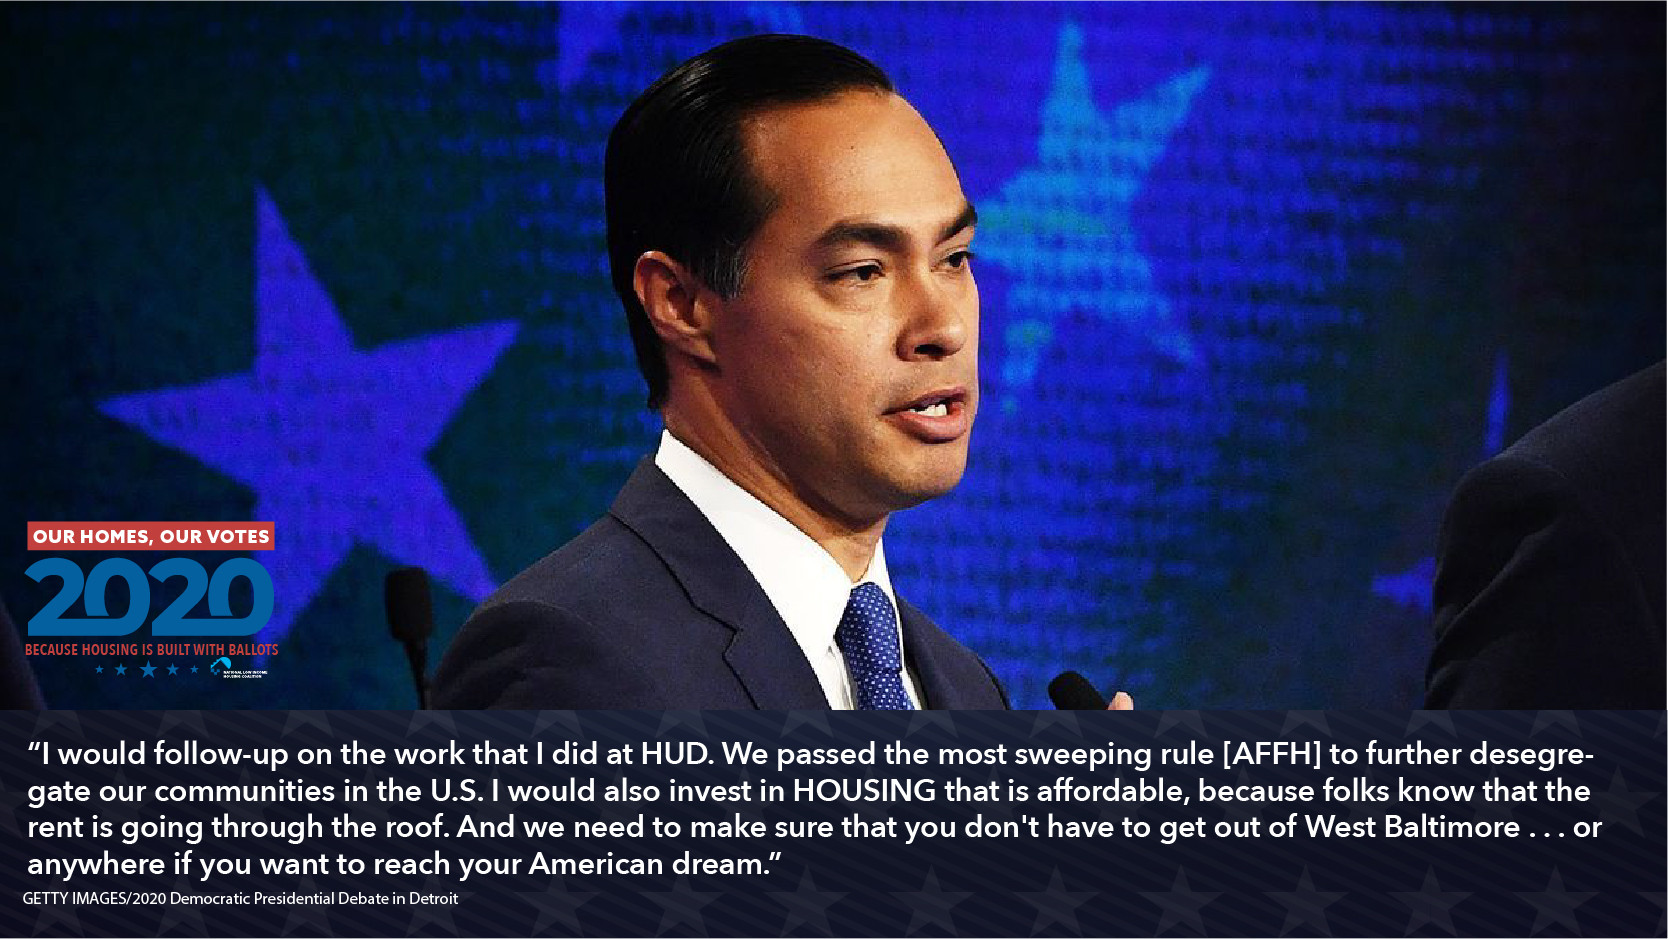 2020_2nd-Dem-Debate_Castro_twitter-2.jpg